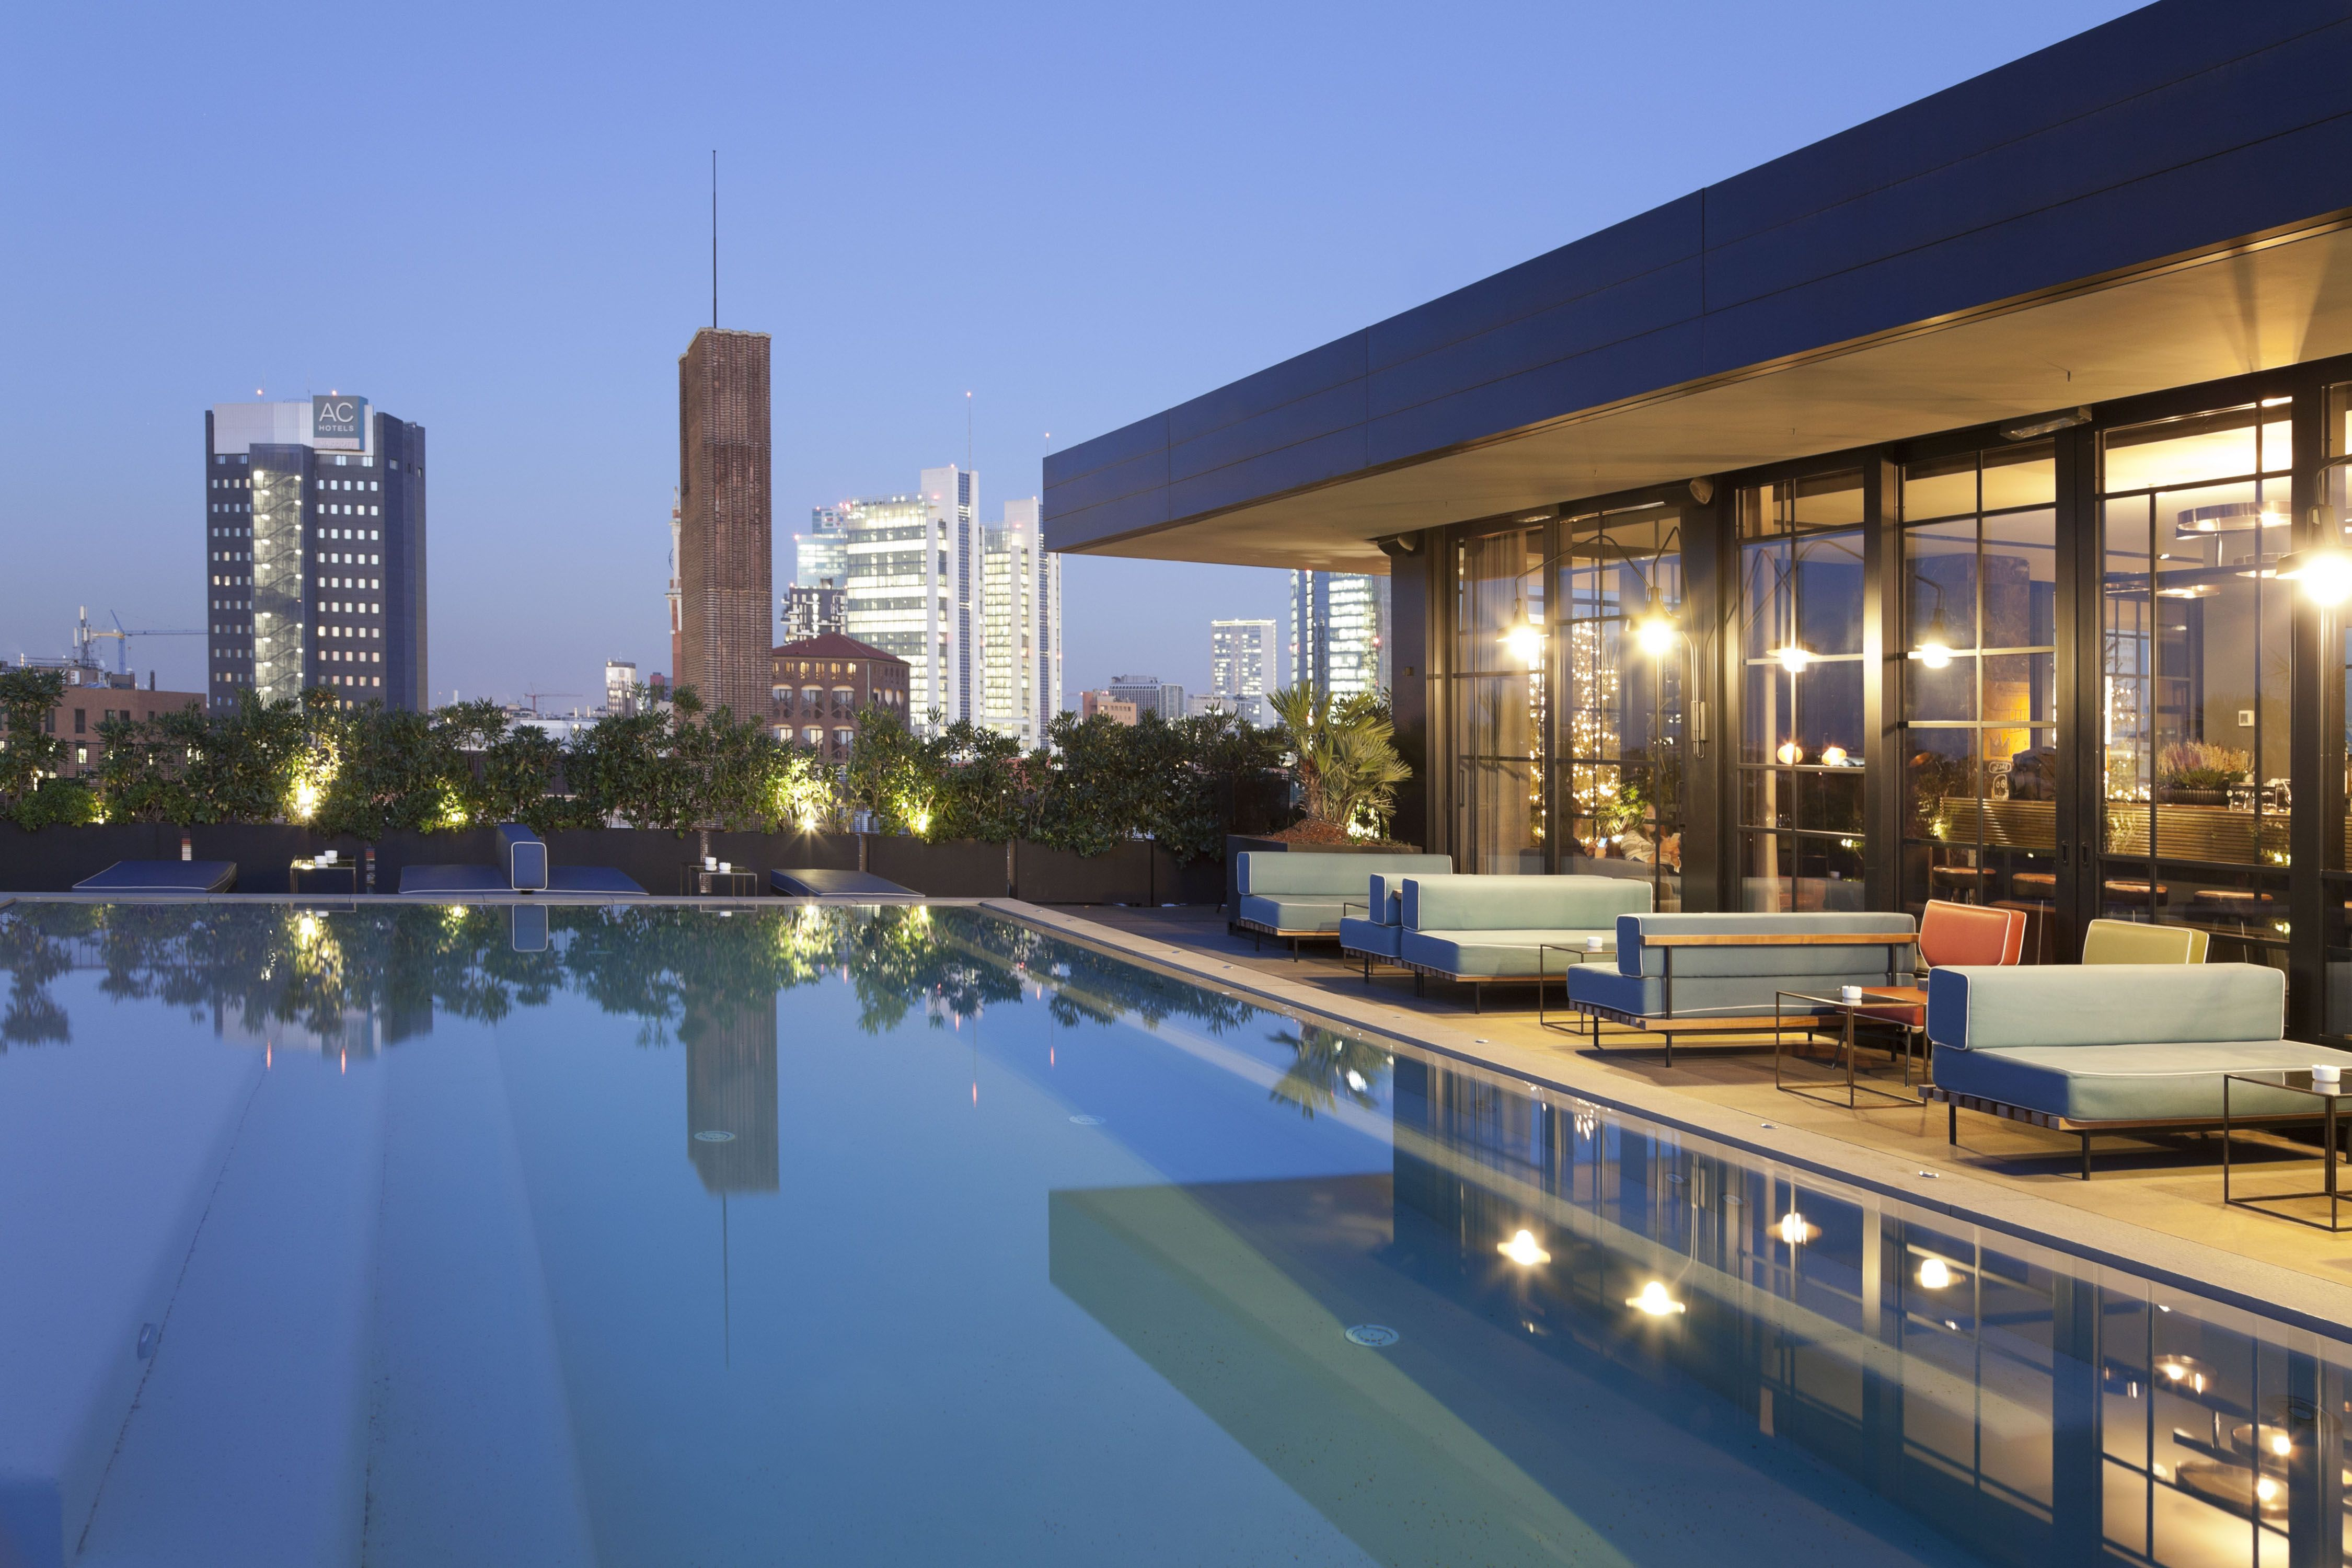 un-estate-a-milano-aperitivi-in-terrazza-sui-rooft-01.jpg (4500×3000 ...